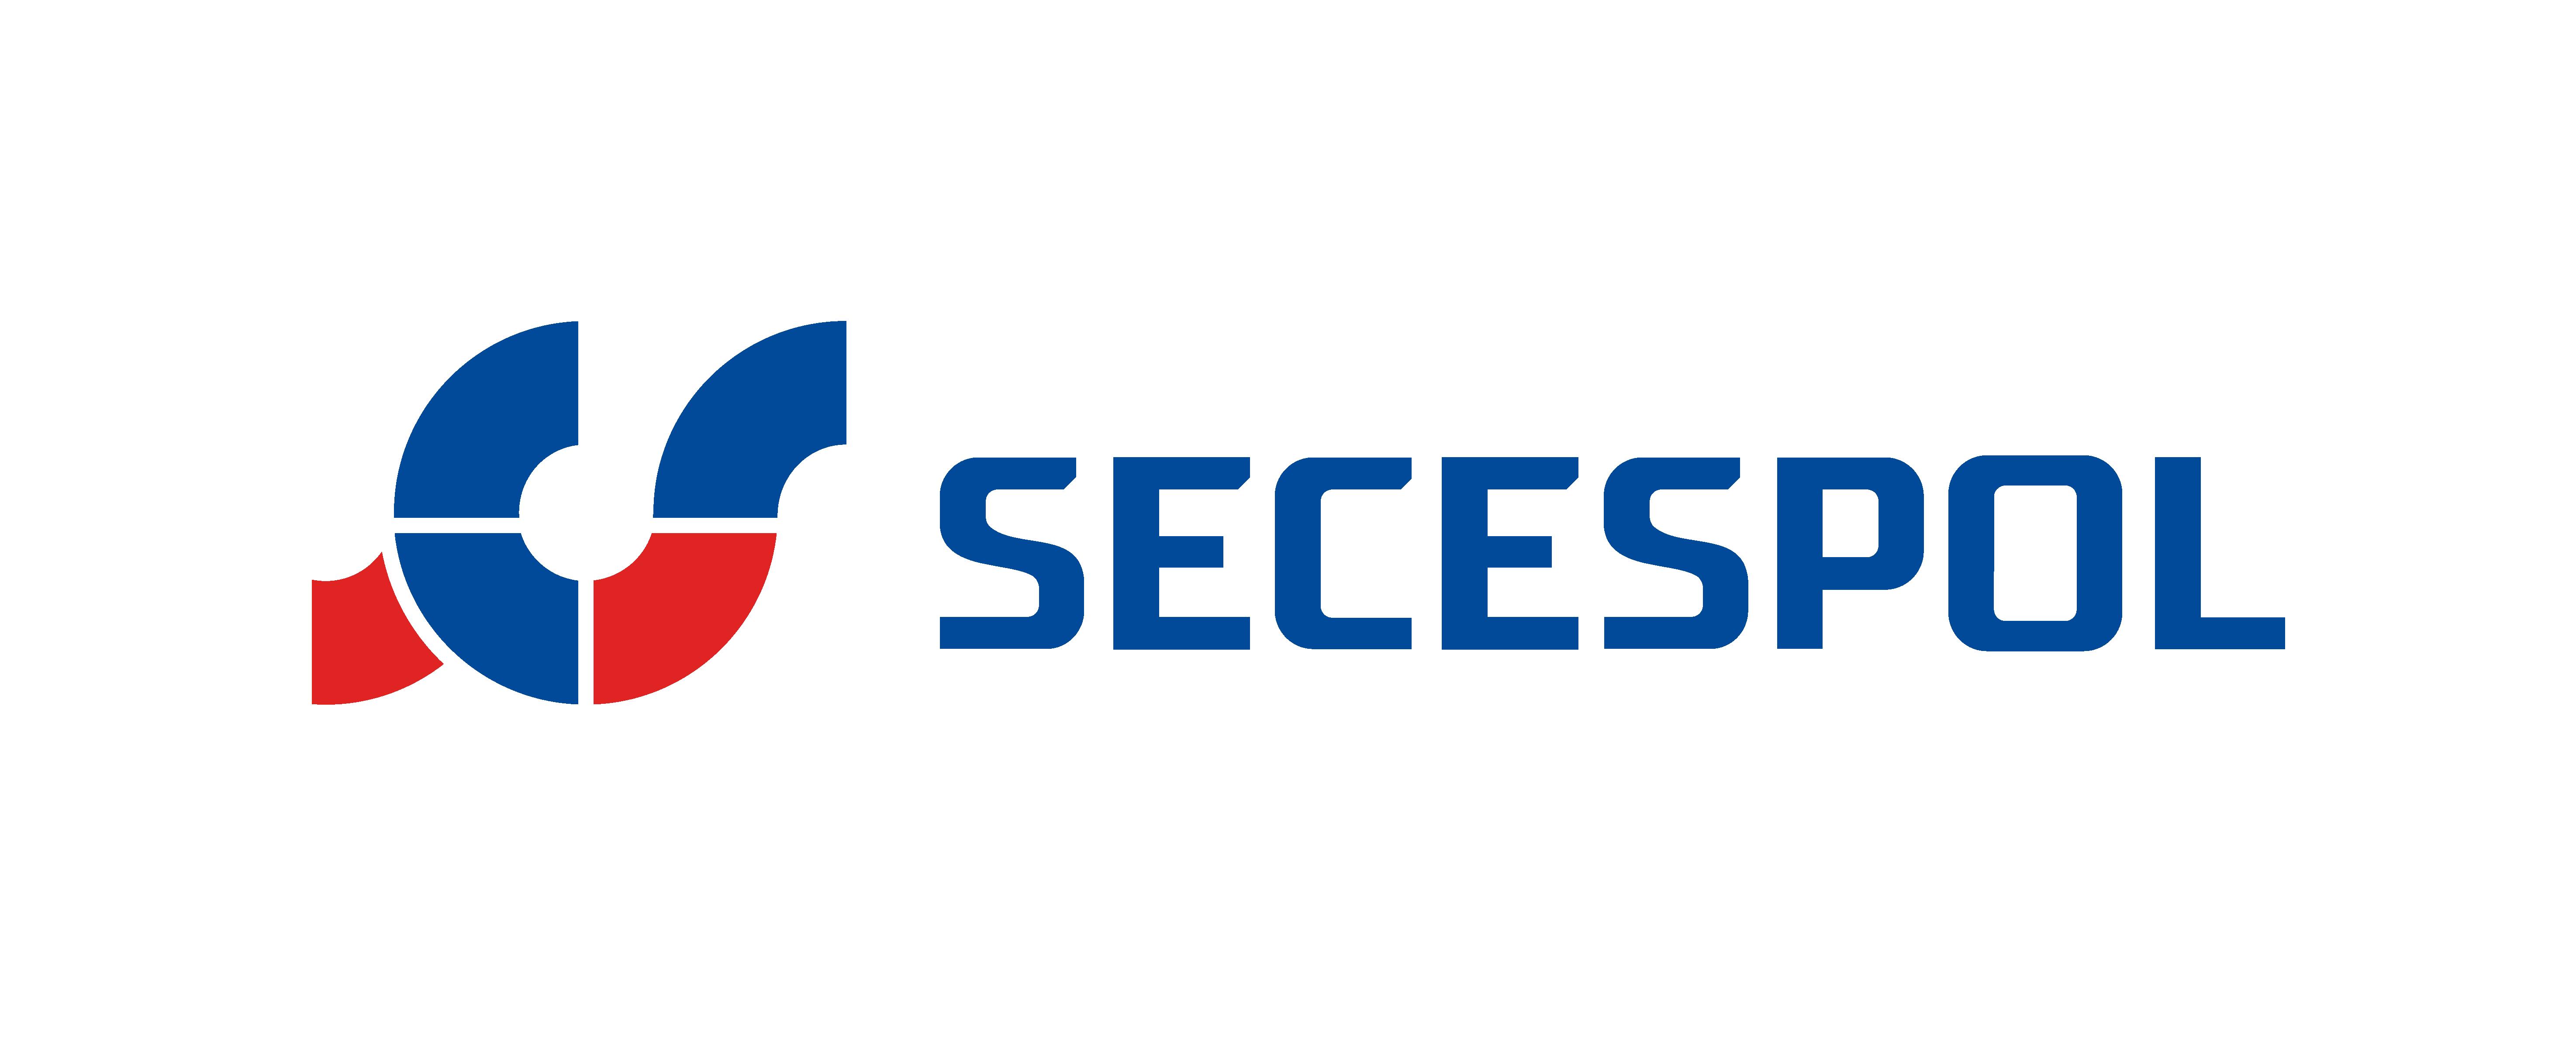 logotyp firma Secespol